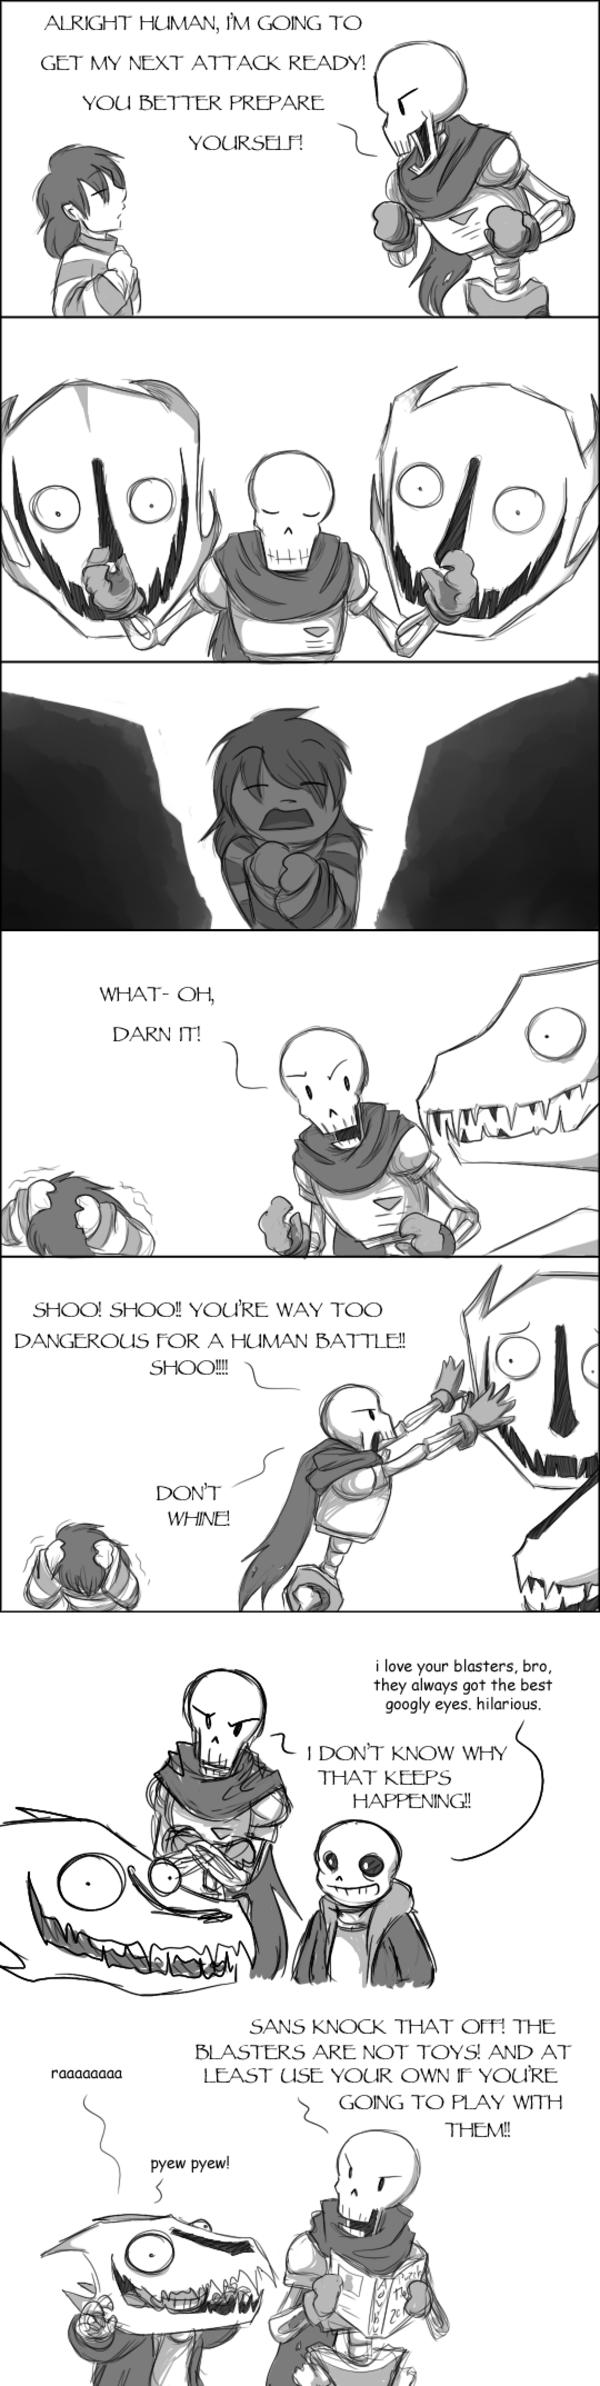 Blaster Fun | Undertale | Know Your Meme